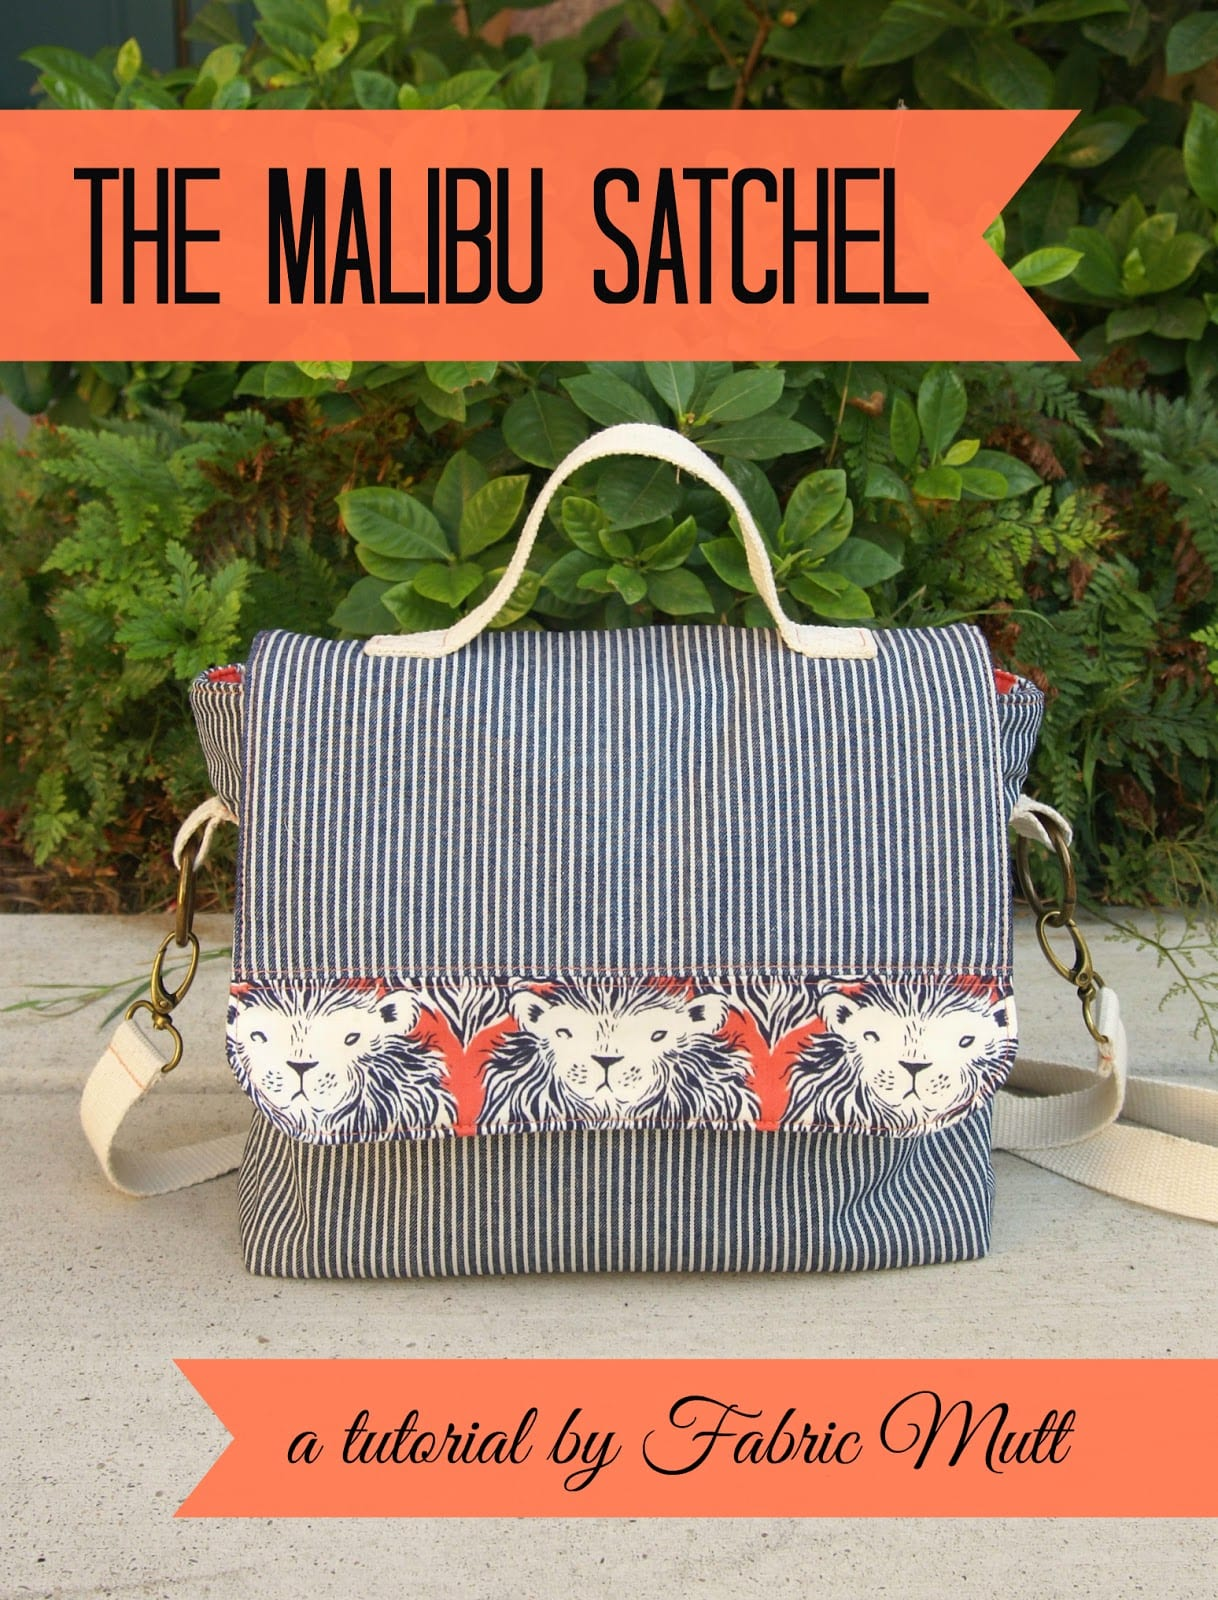 Malibu Satchel